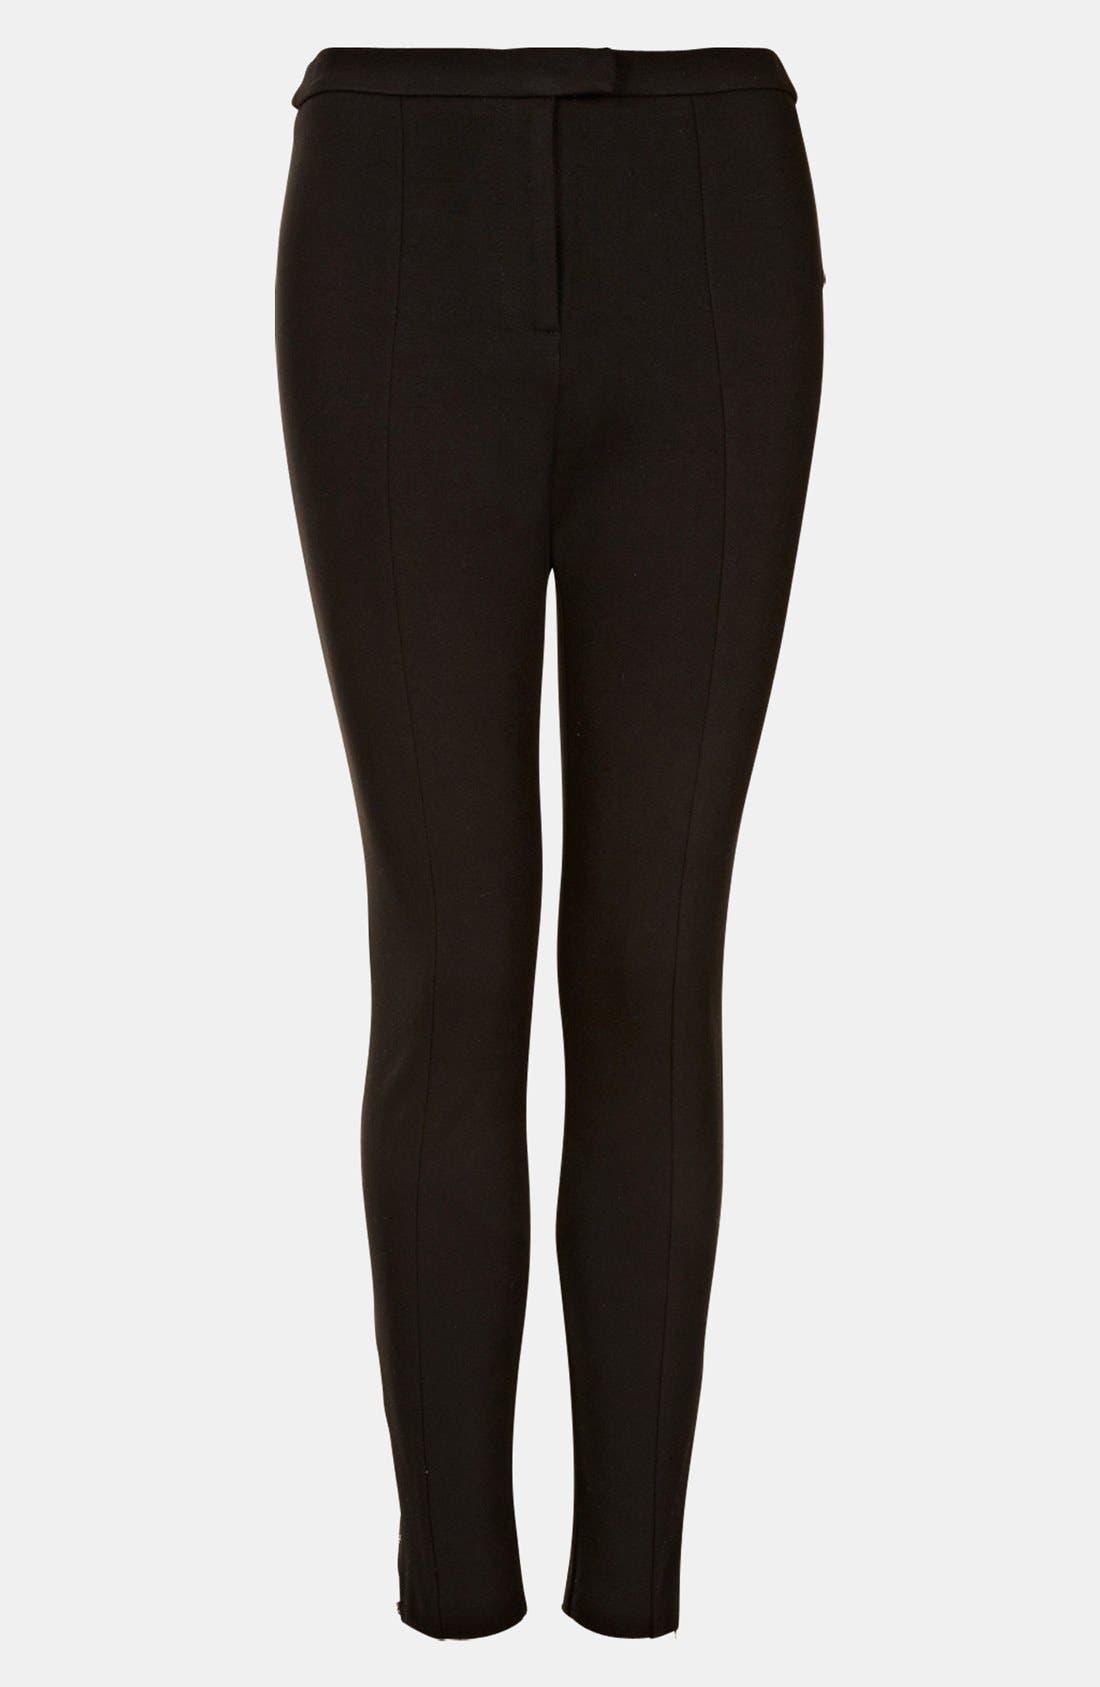 Alternate Image 1 Selected - Topshop High Waist Ponte Skinny Pants